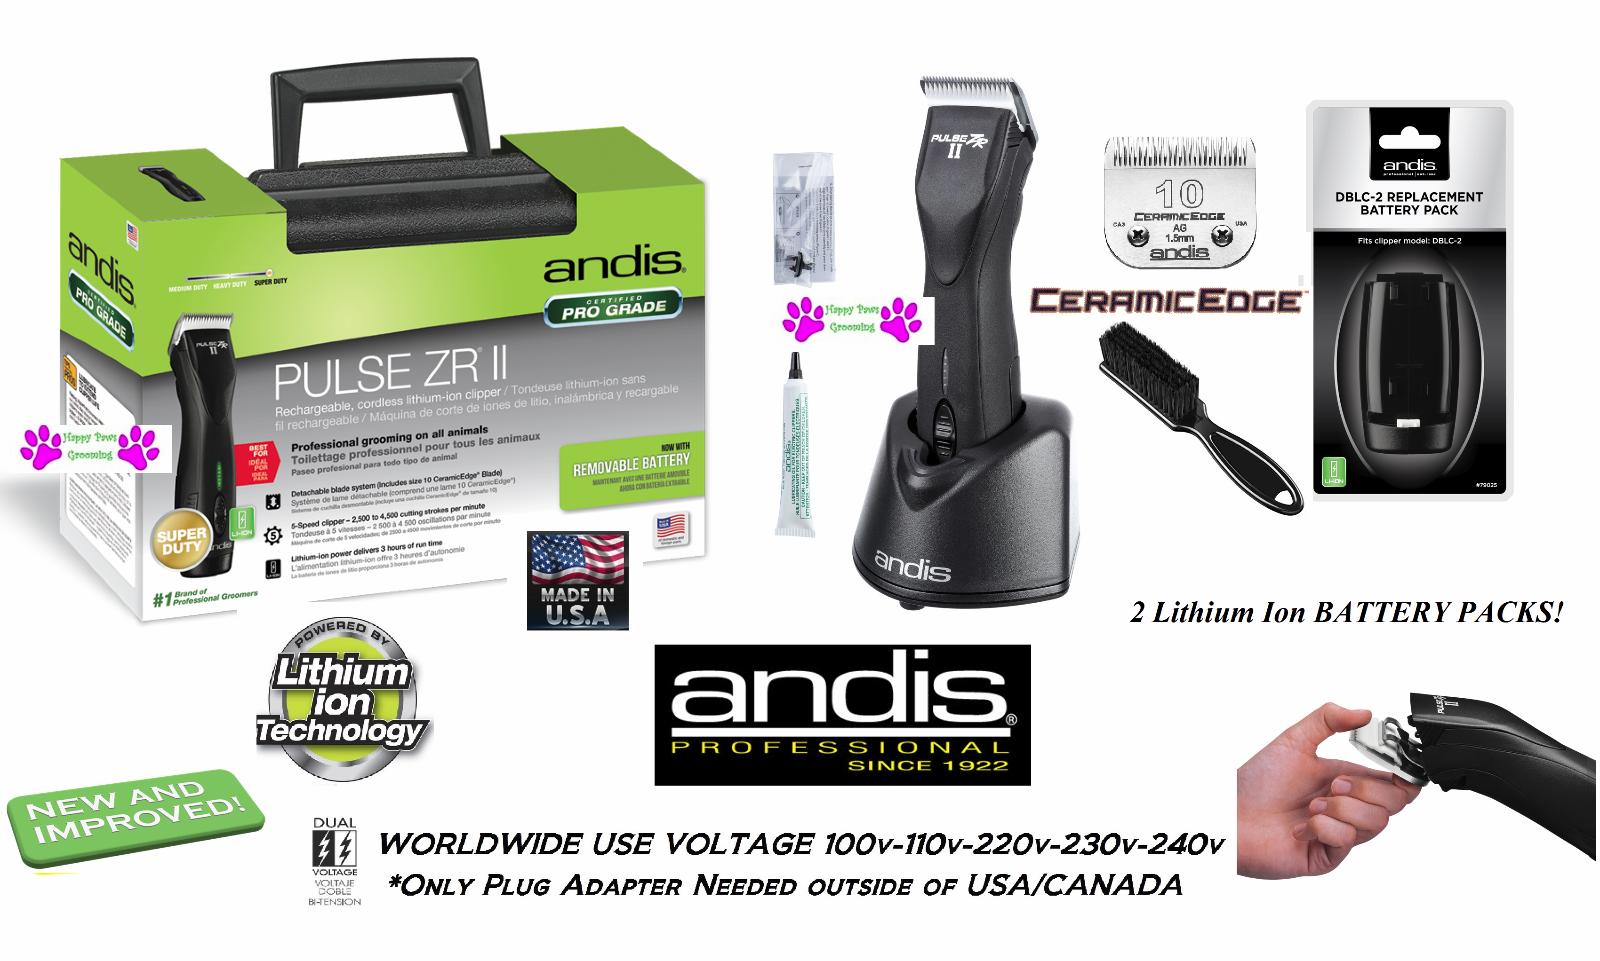 Andis Impuls ZR II Kabellos Li Ion Zange KIT&2 Batterie, Ceramicedge Blade, Case